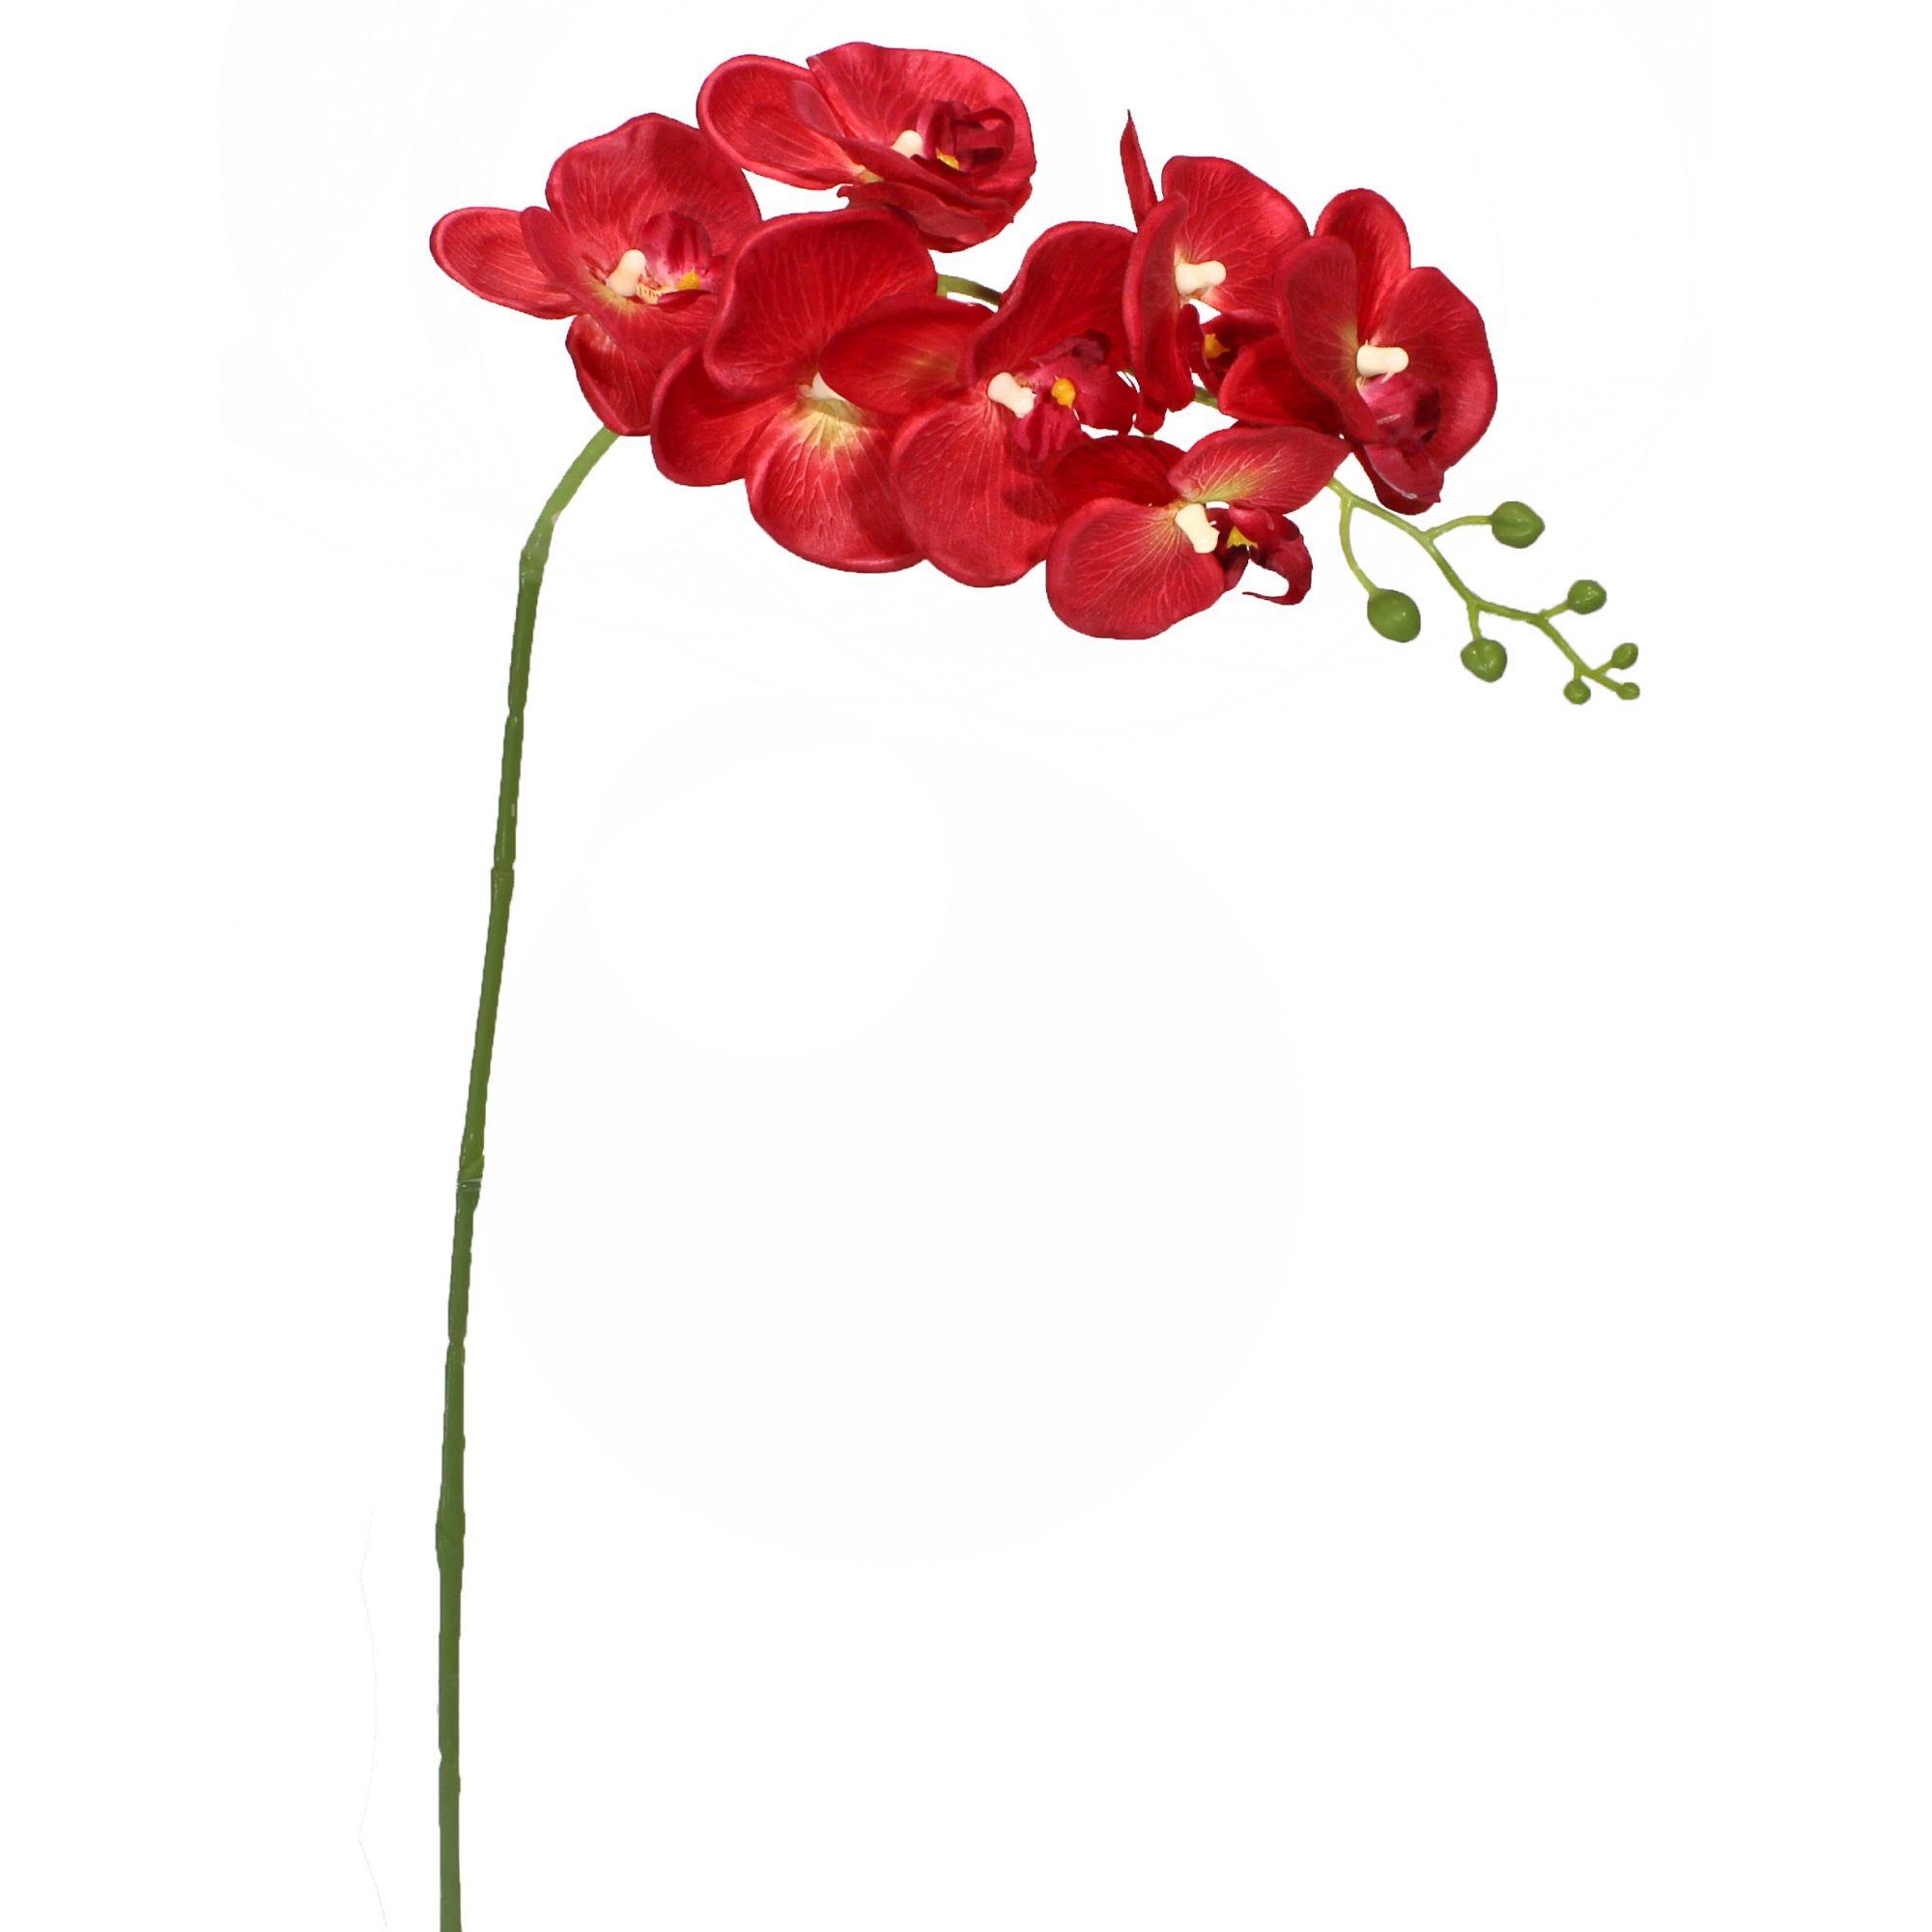 Flor De Orquídea - Tecido - Phalaenopsis X7 - 75Cm